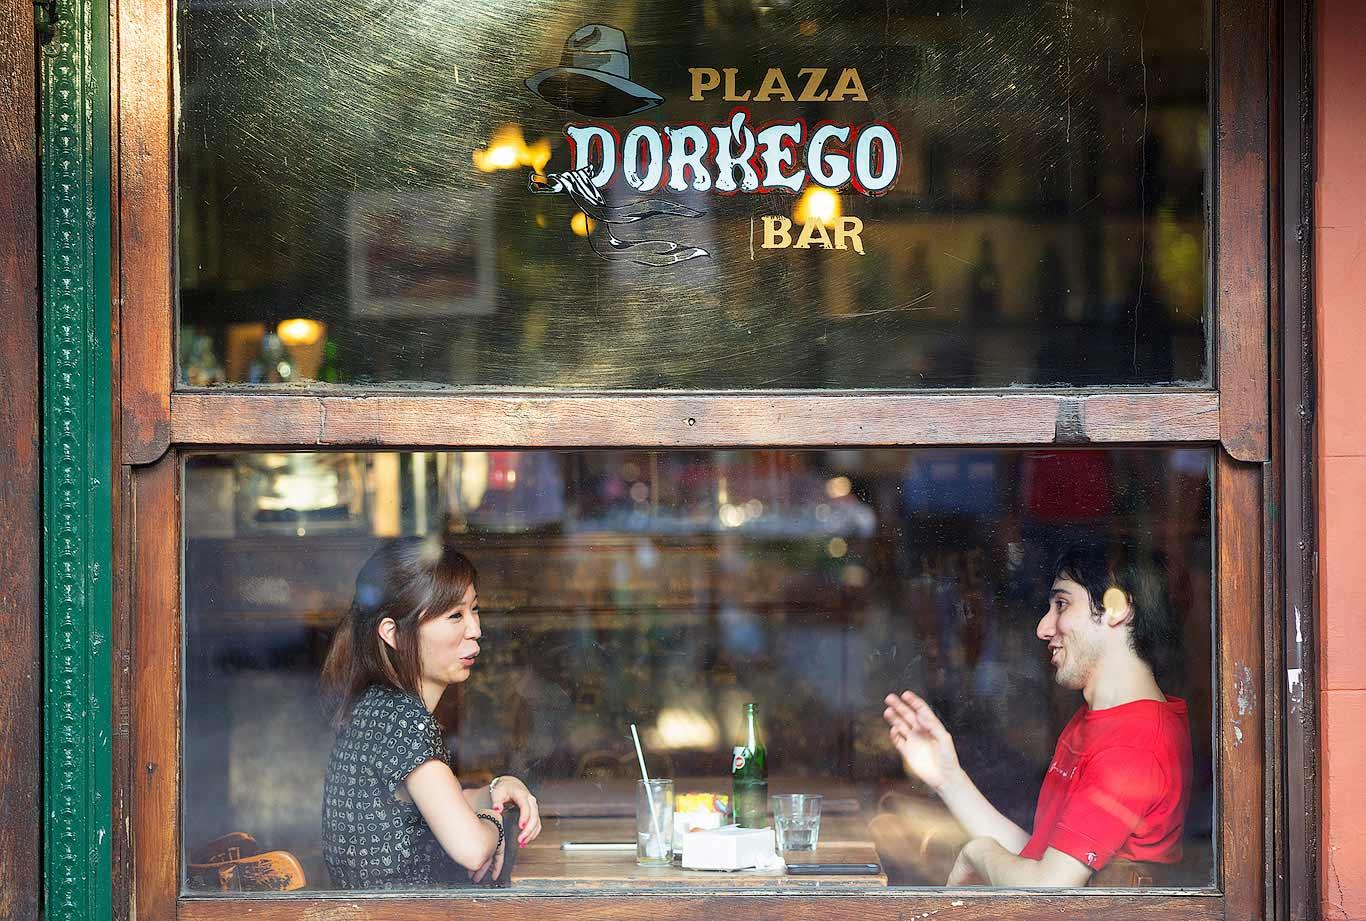 Plaza Dorrego Bar, San Telmo